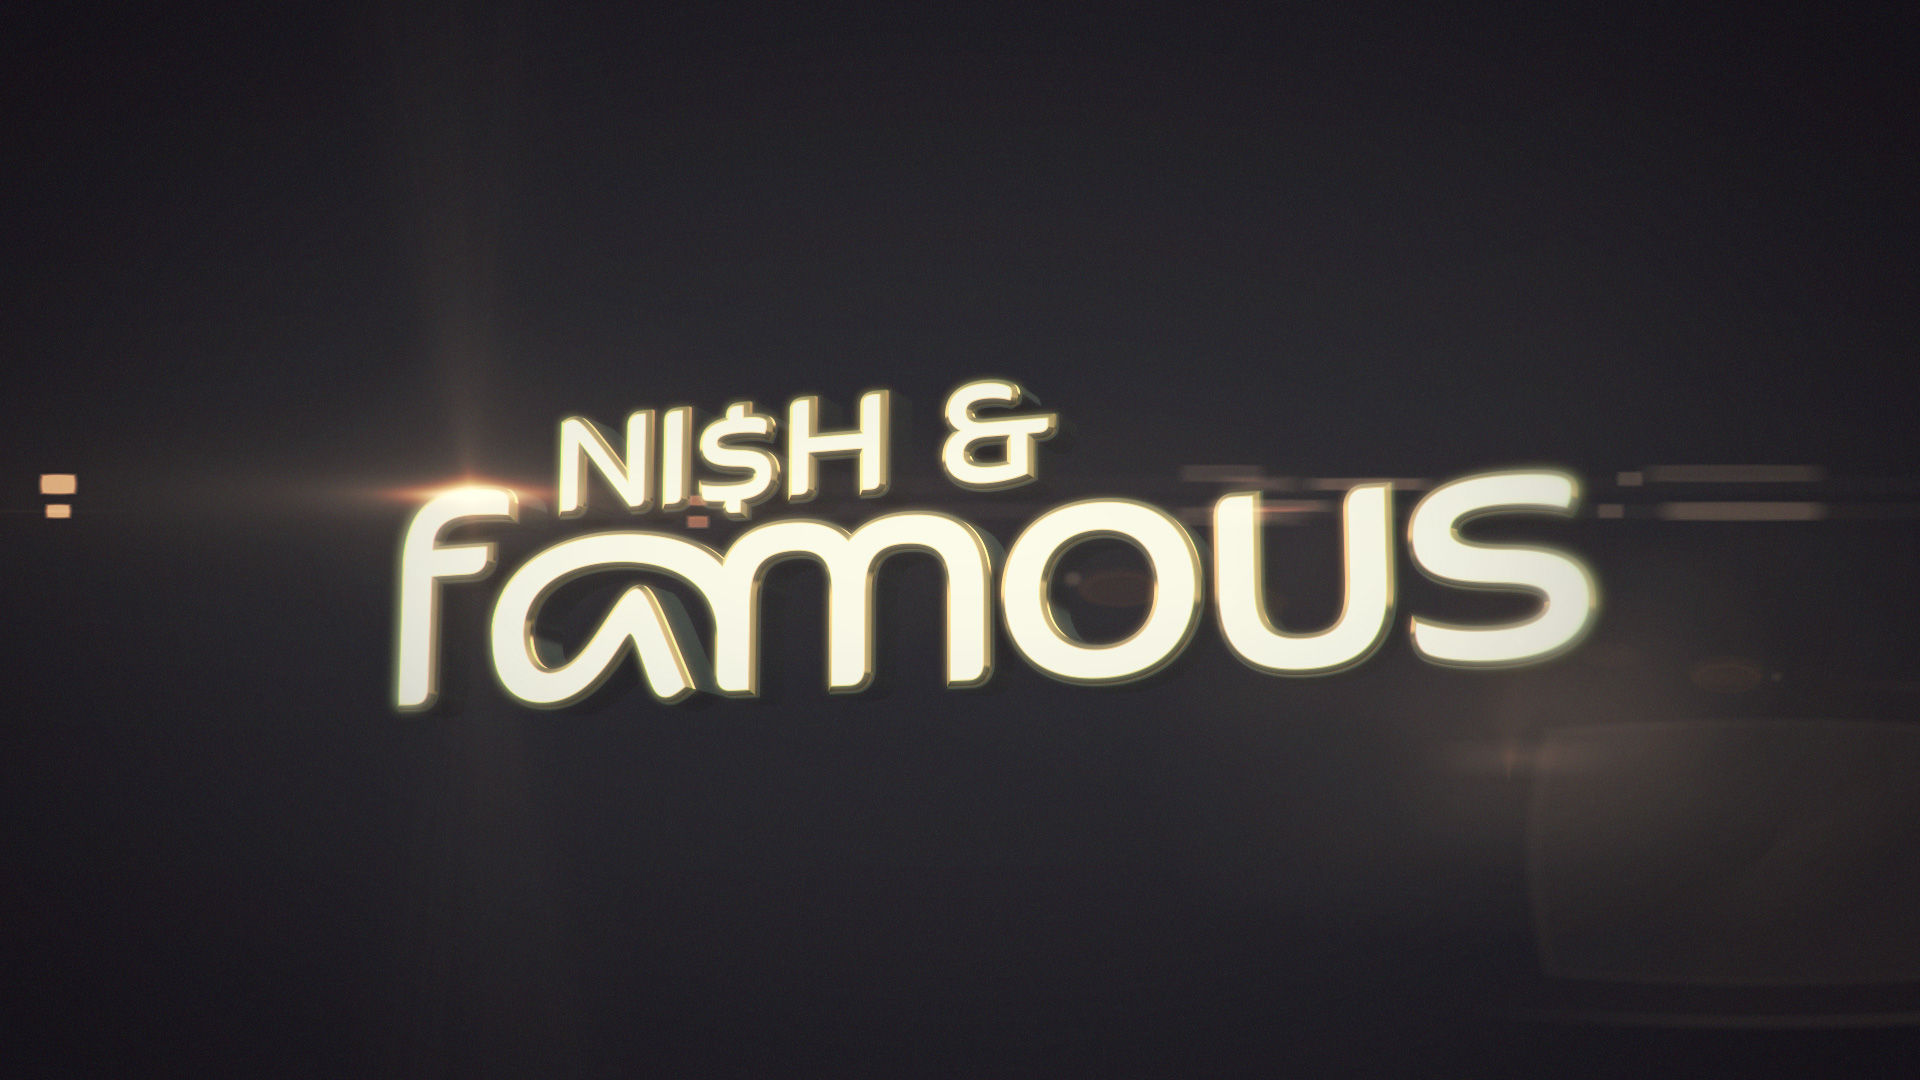 Nish-&-Famous-Logo-Version-1.jpg